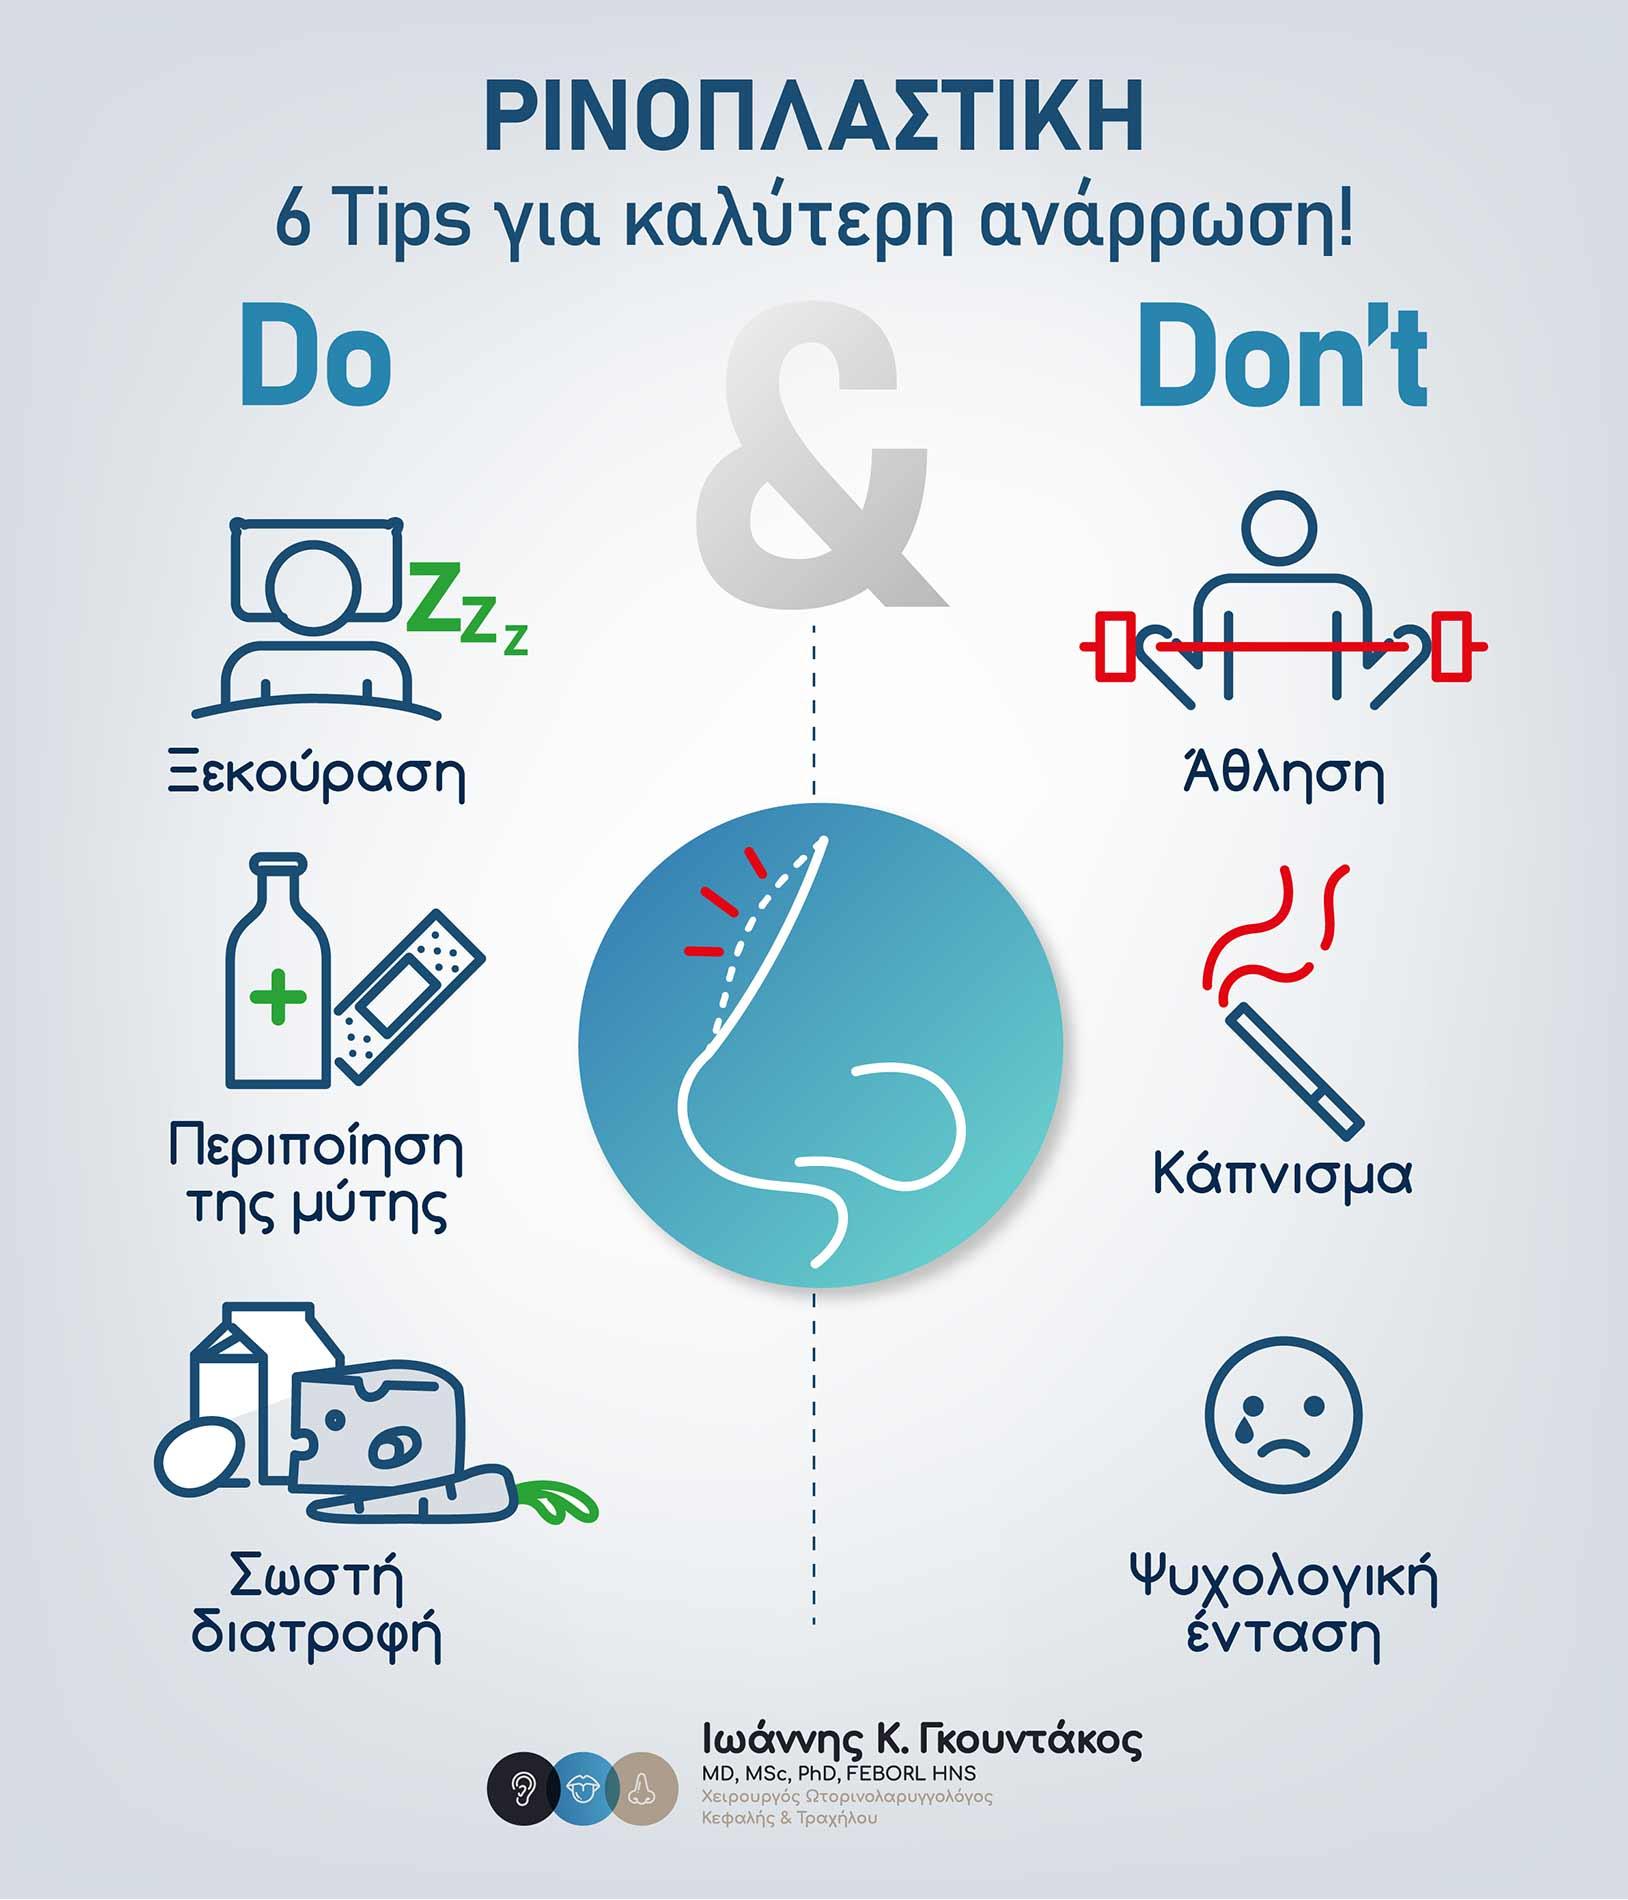 6 tips ανάρρωσης μετά από ρινοπλαστική